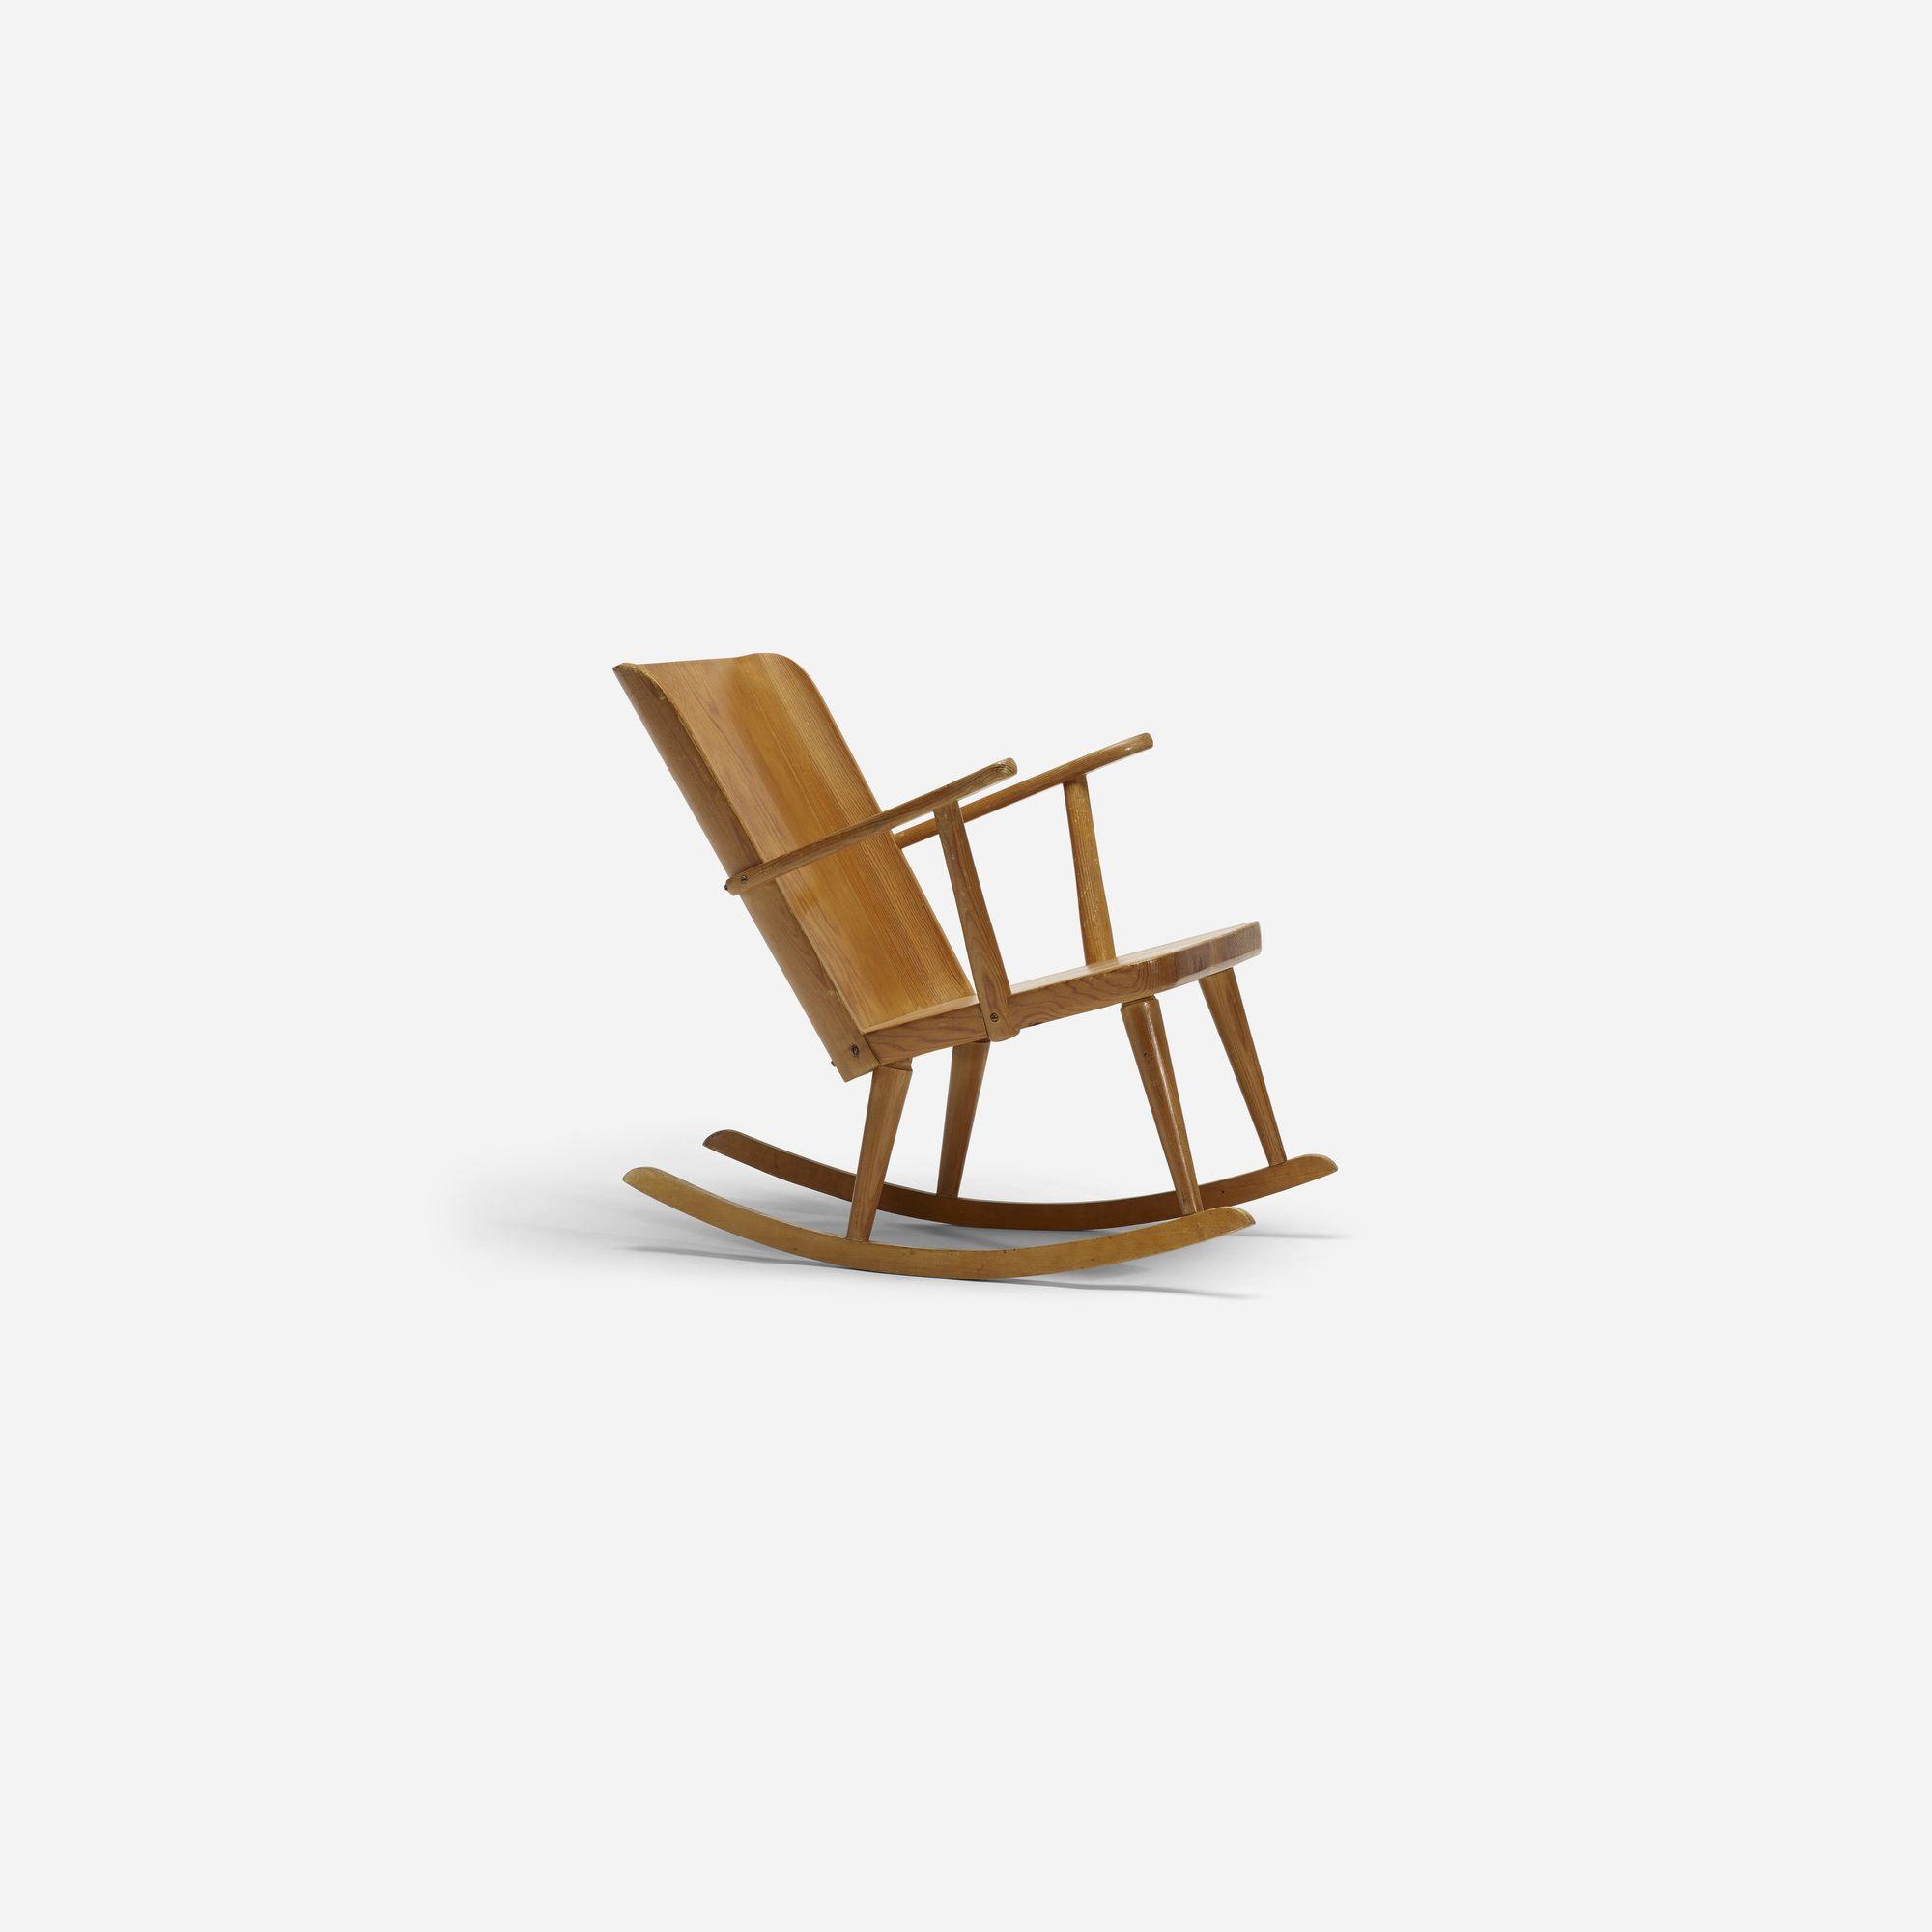 241: Carl Malmsten / Pine Rocking Chair (3 Of 3)